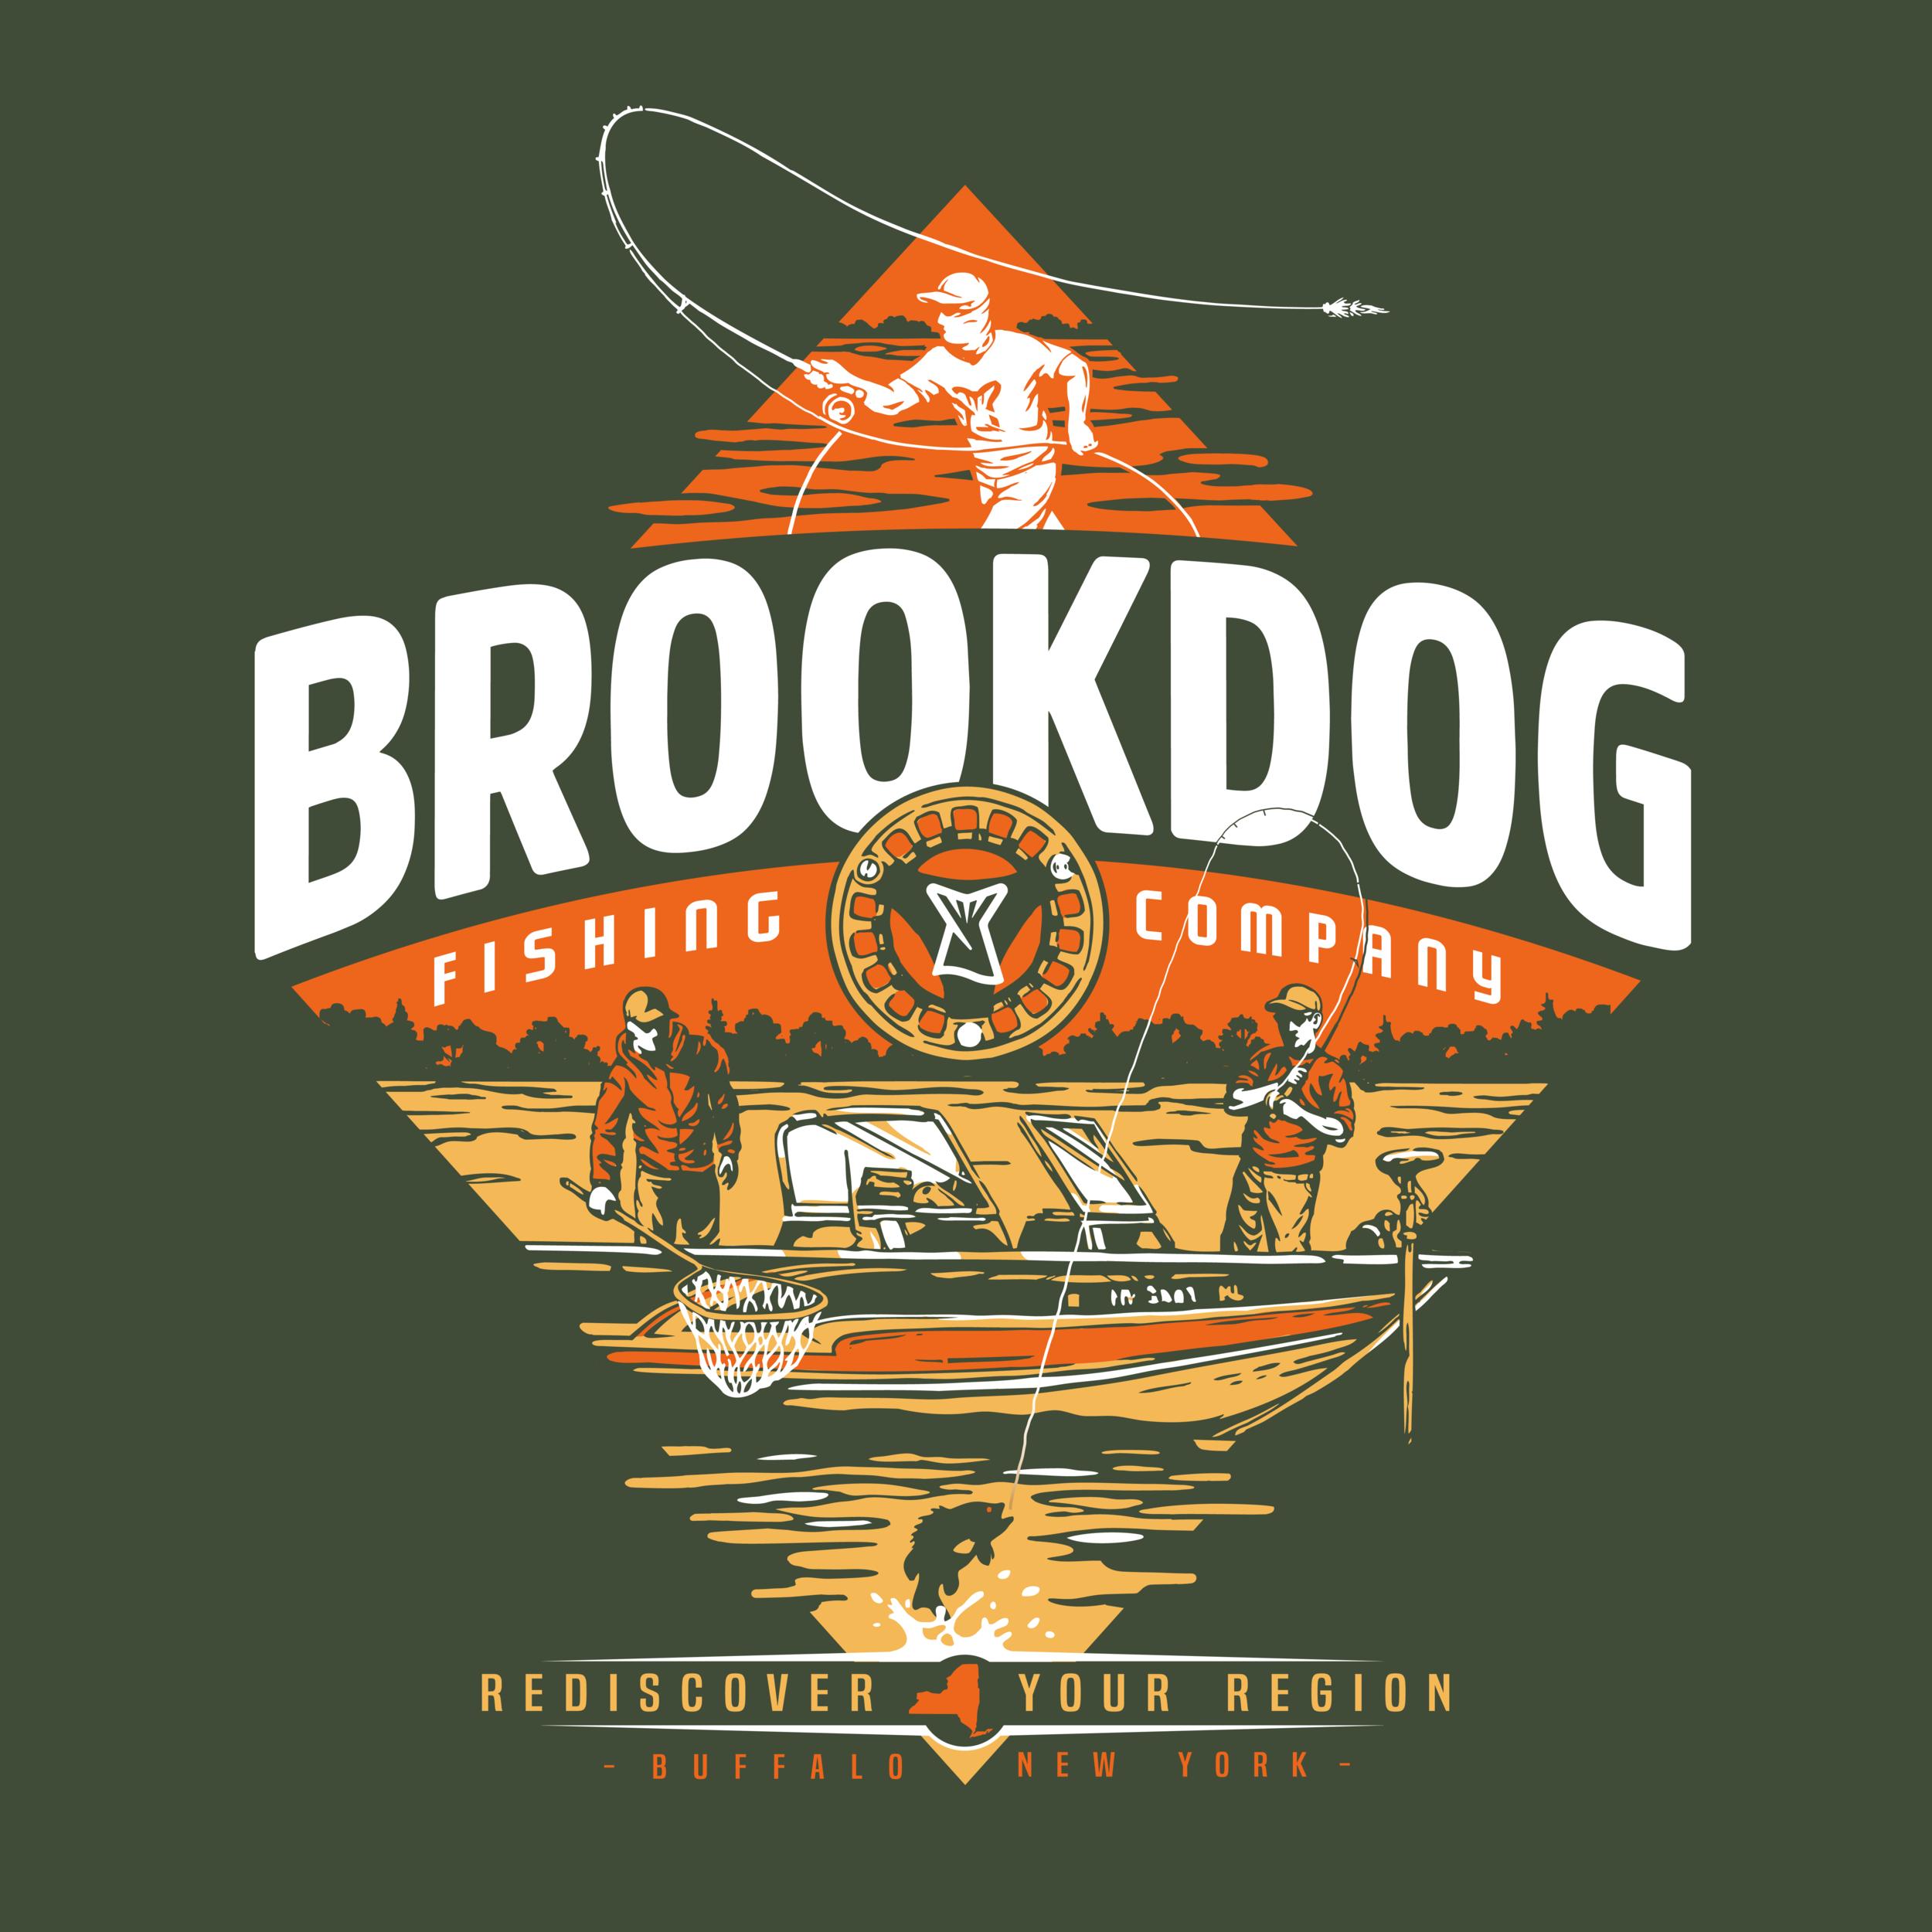 Brookdog.png